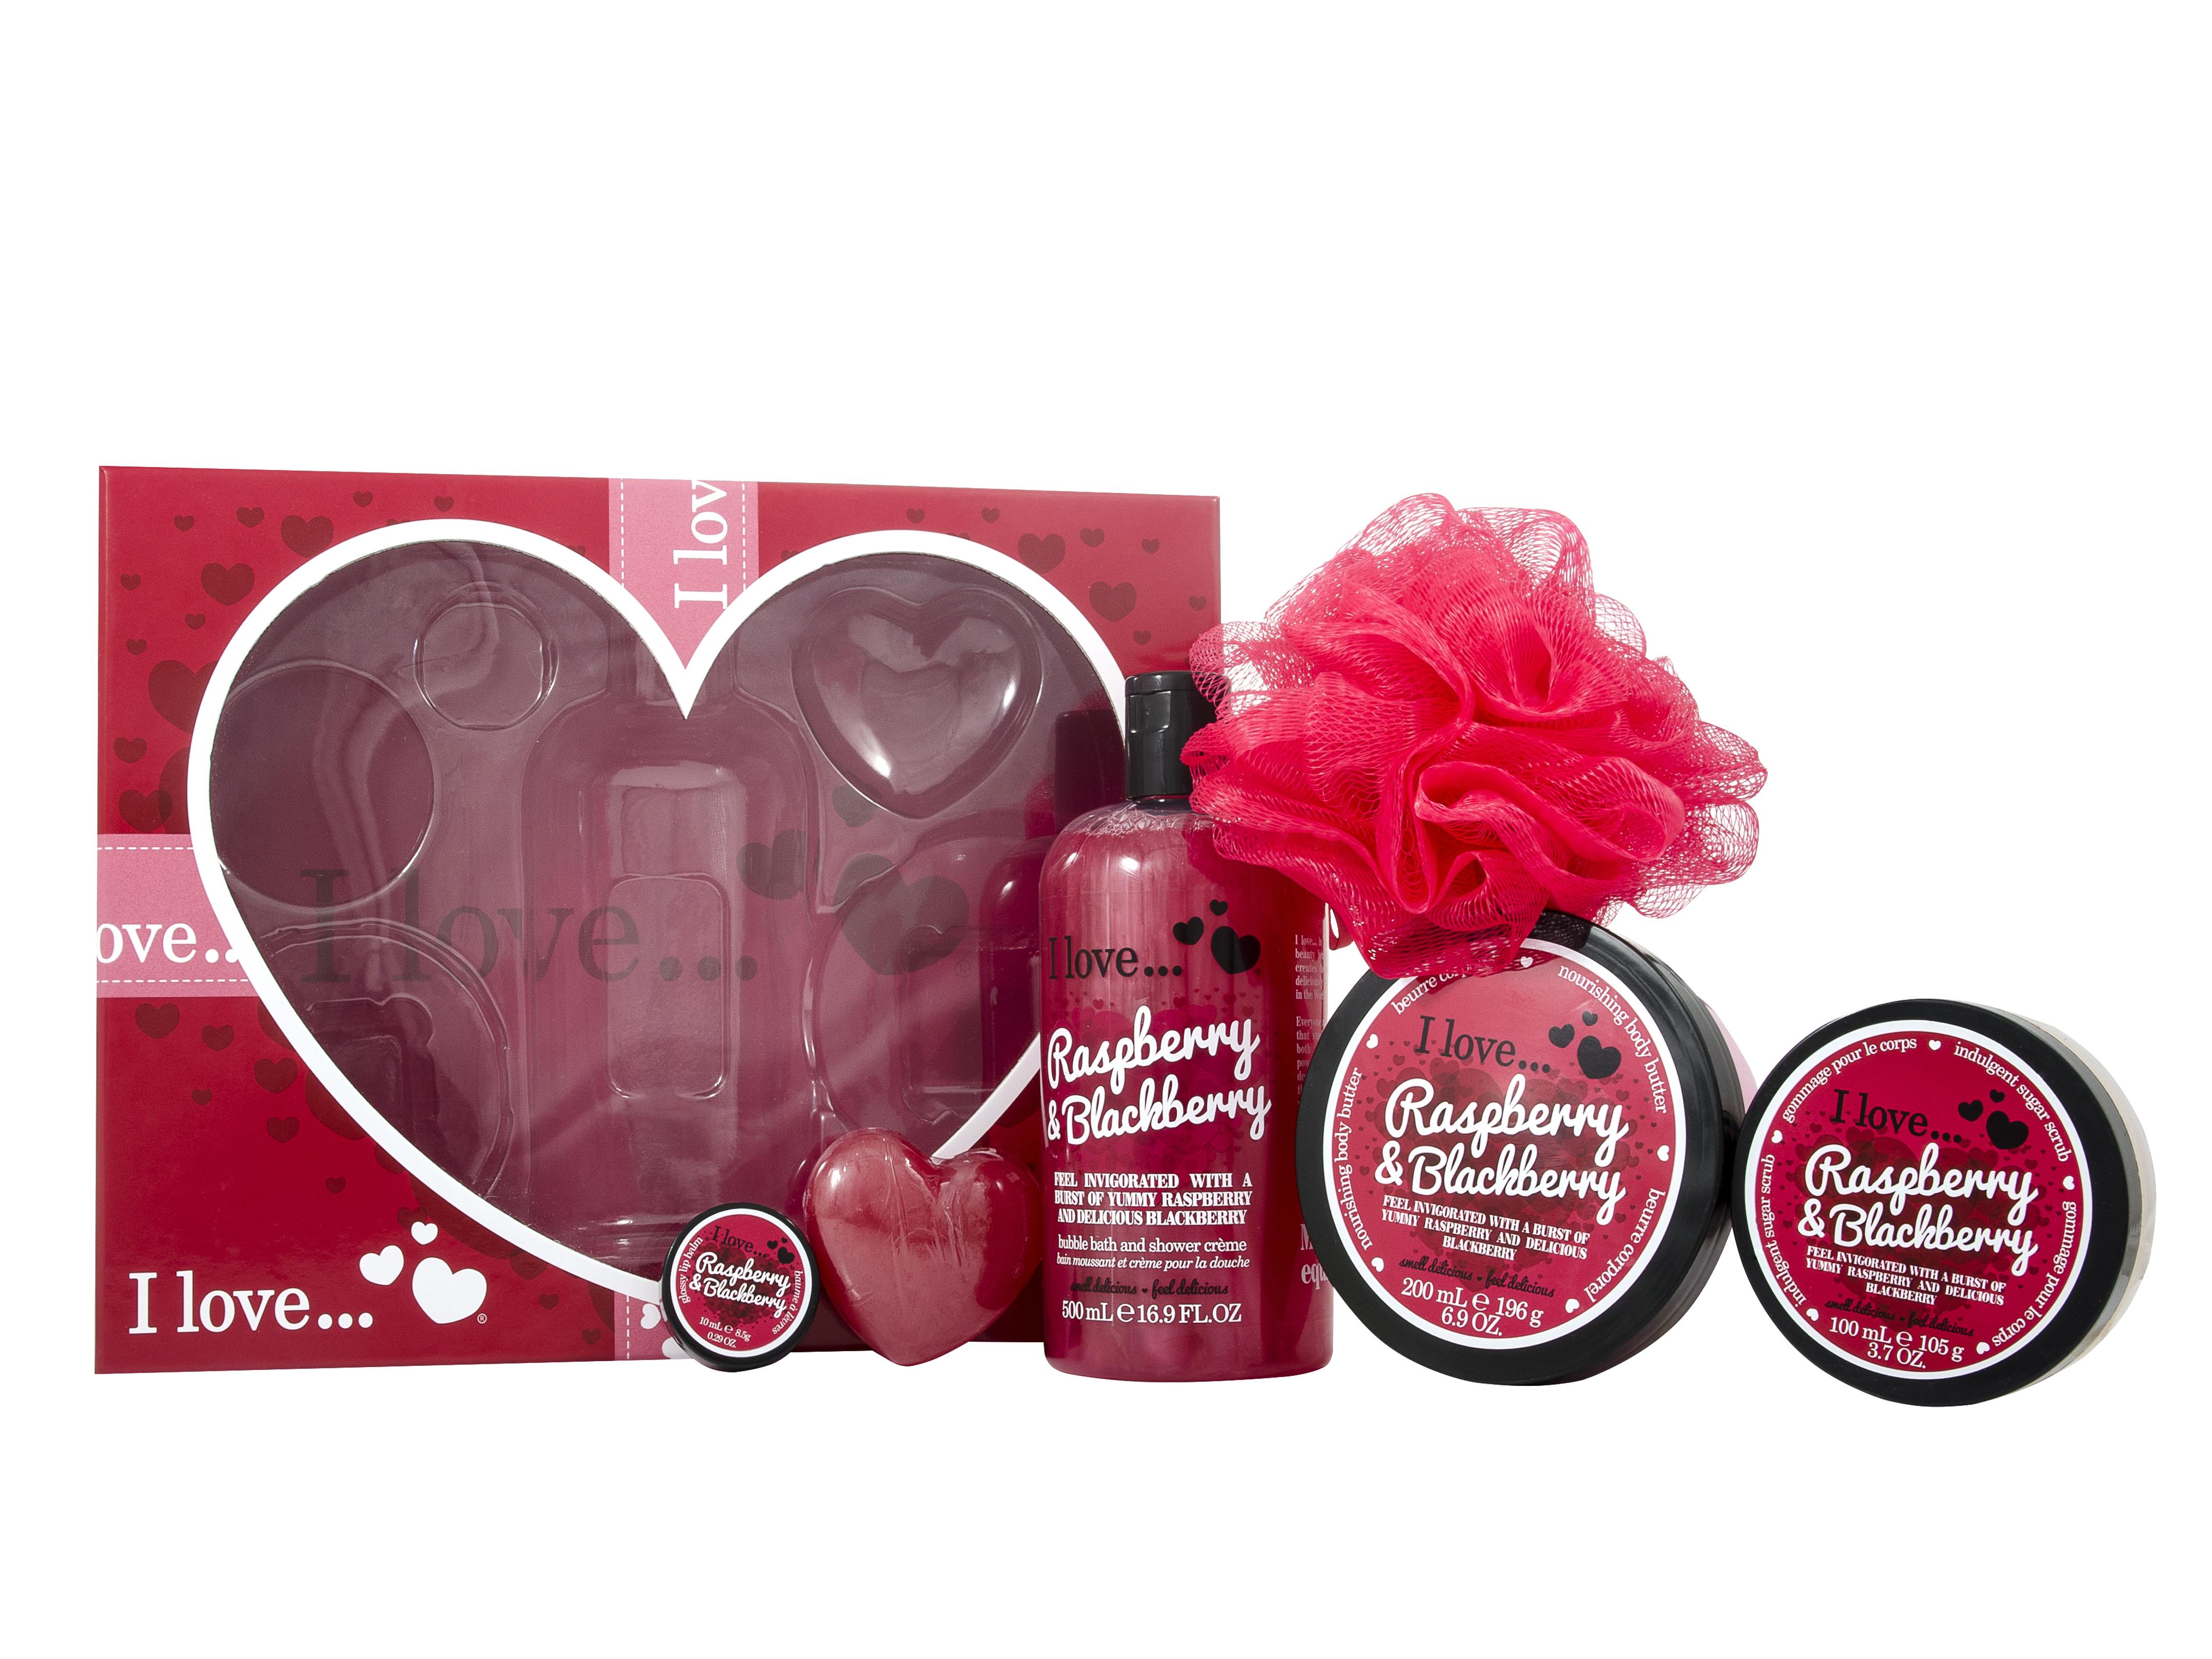 I Love Raspberries And Blackberry Bath & Body 5 Pieces Gift Set